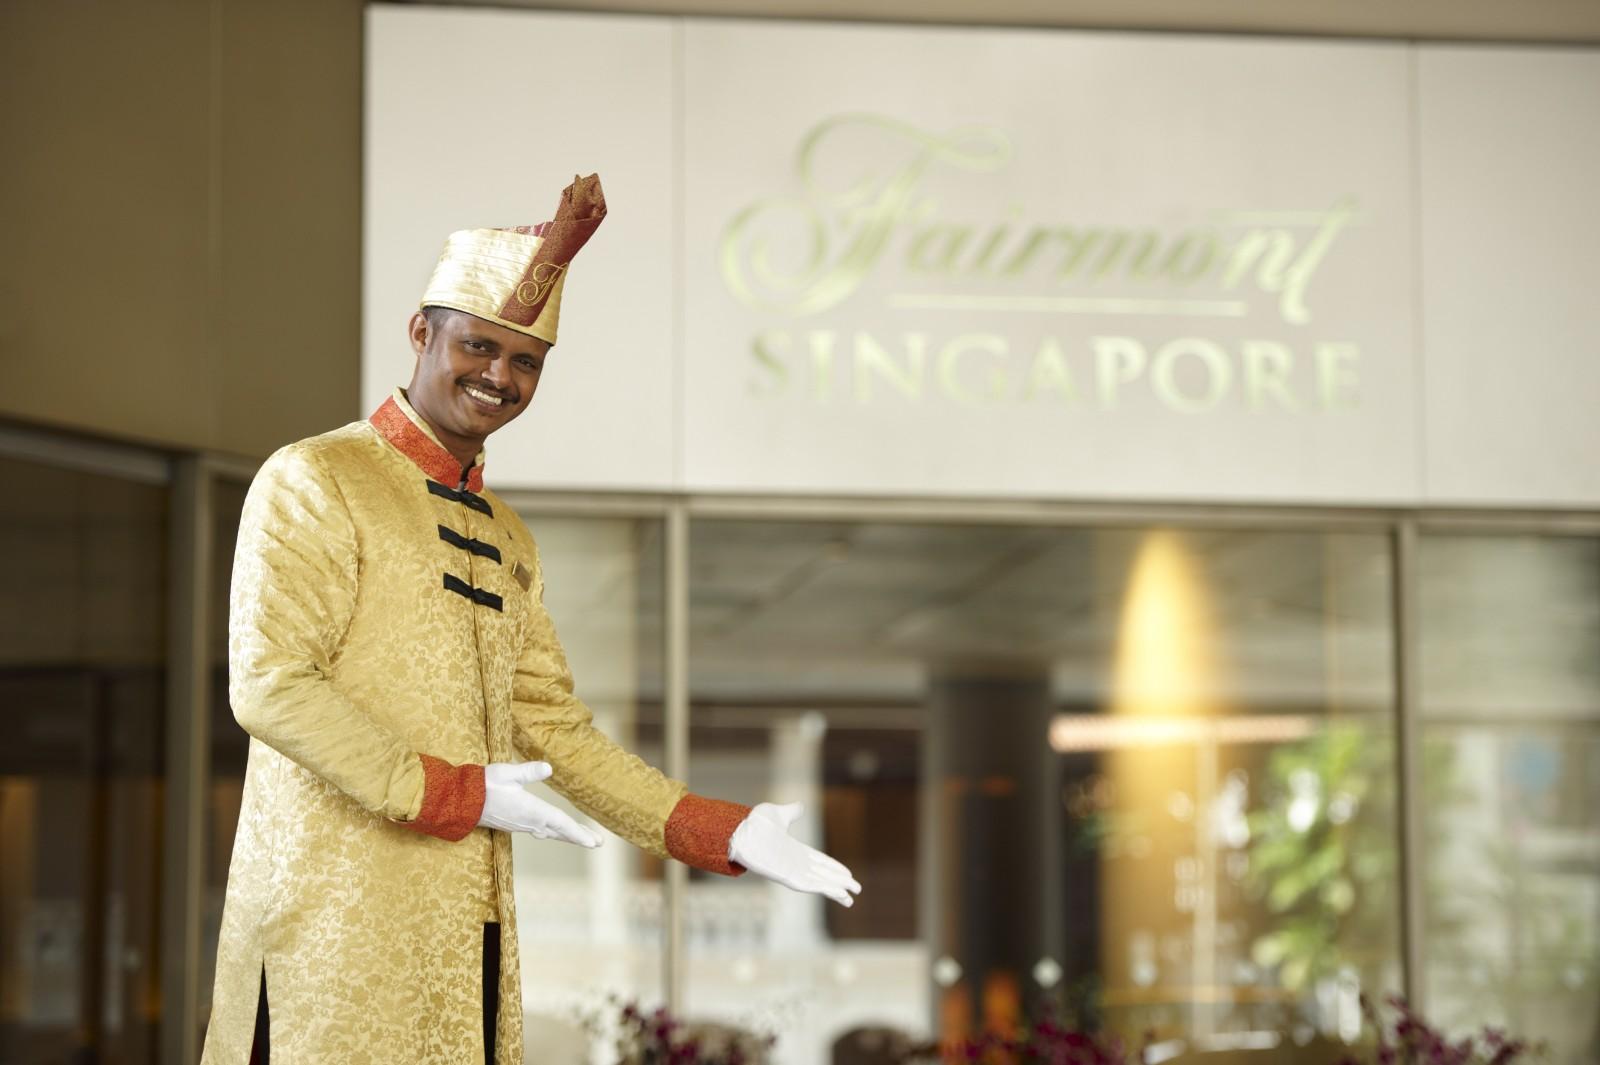 Singapore Fairmont main image